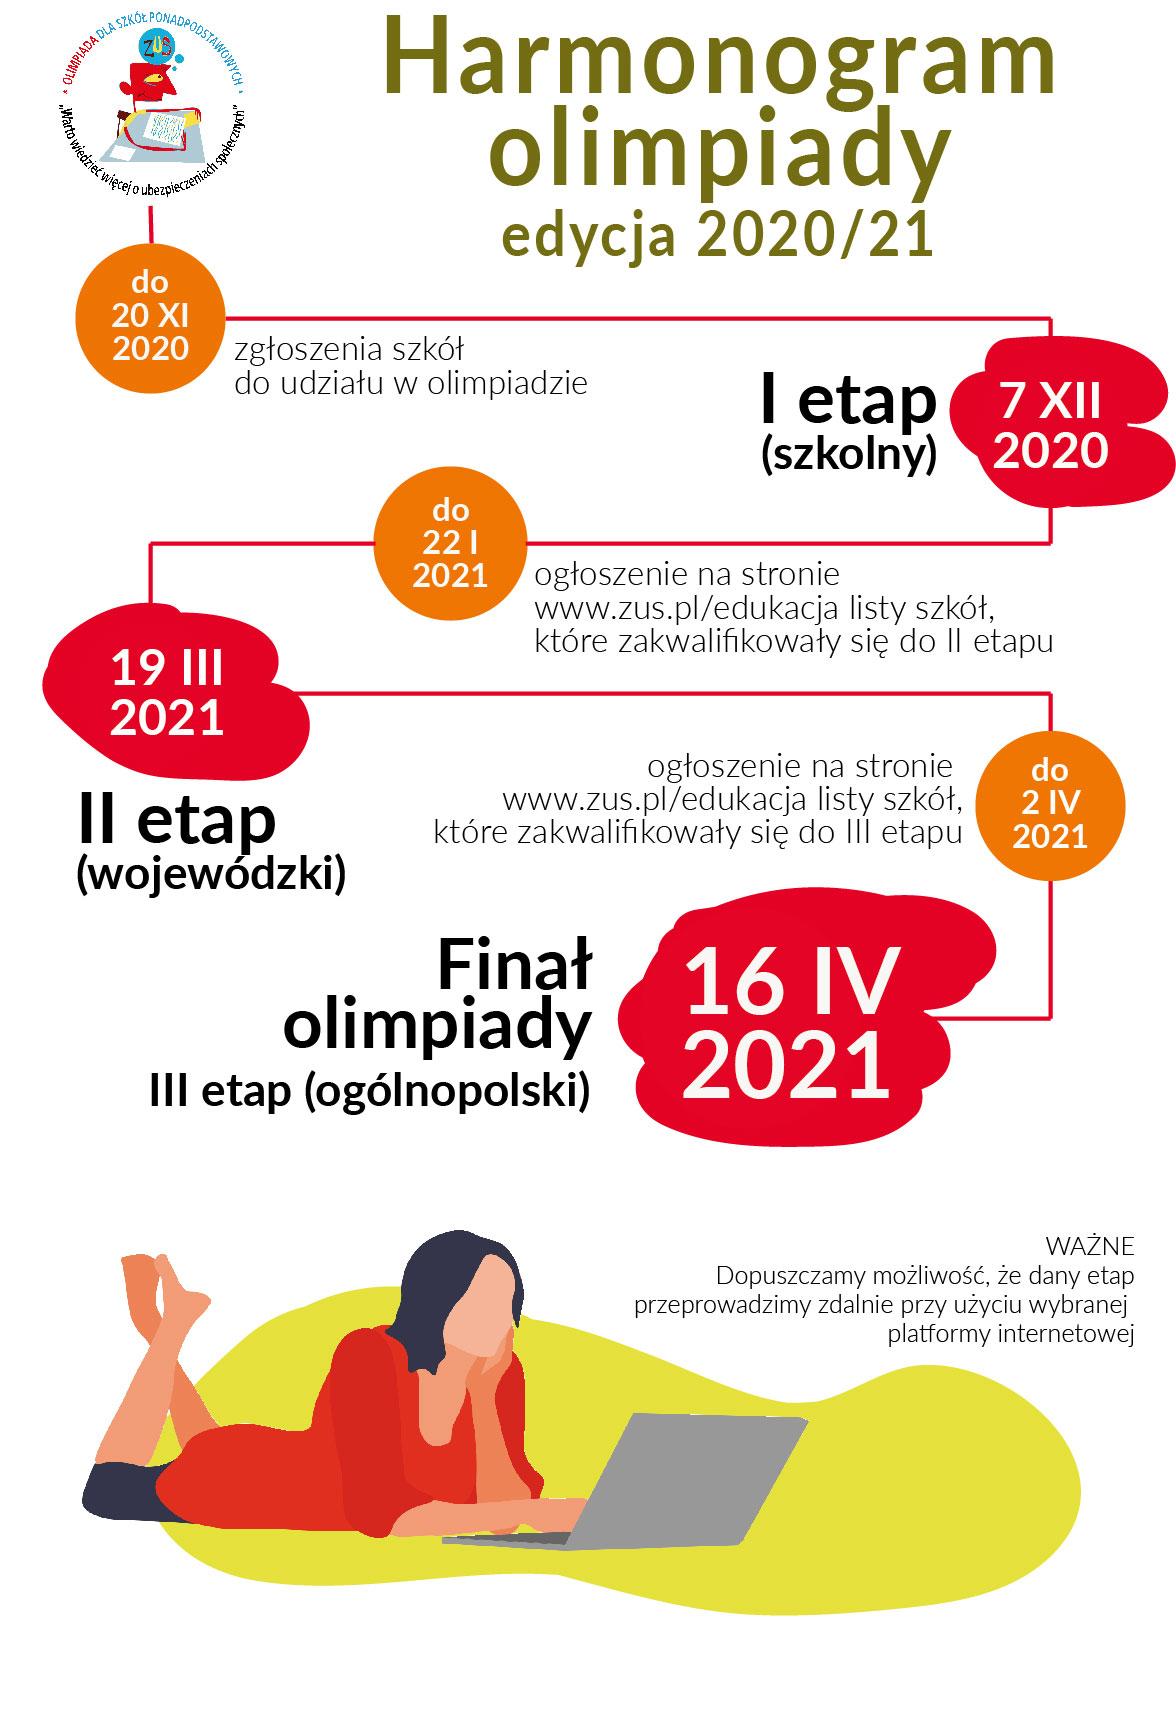 harmonogram olimpiady 2020_21